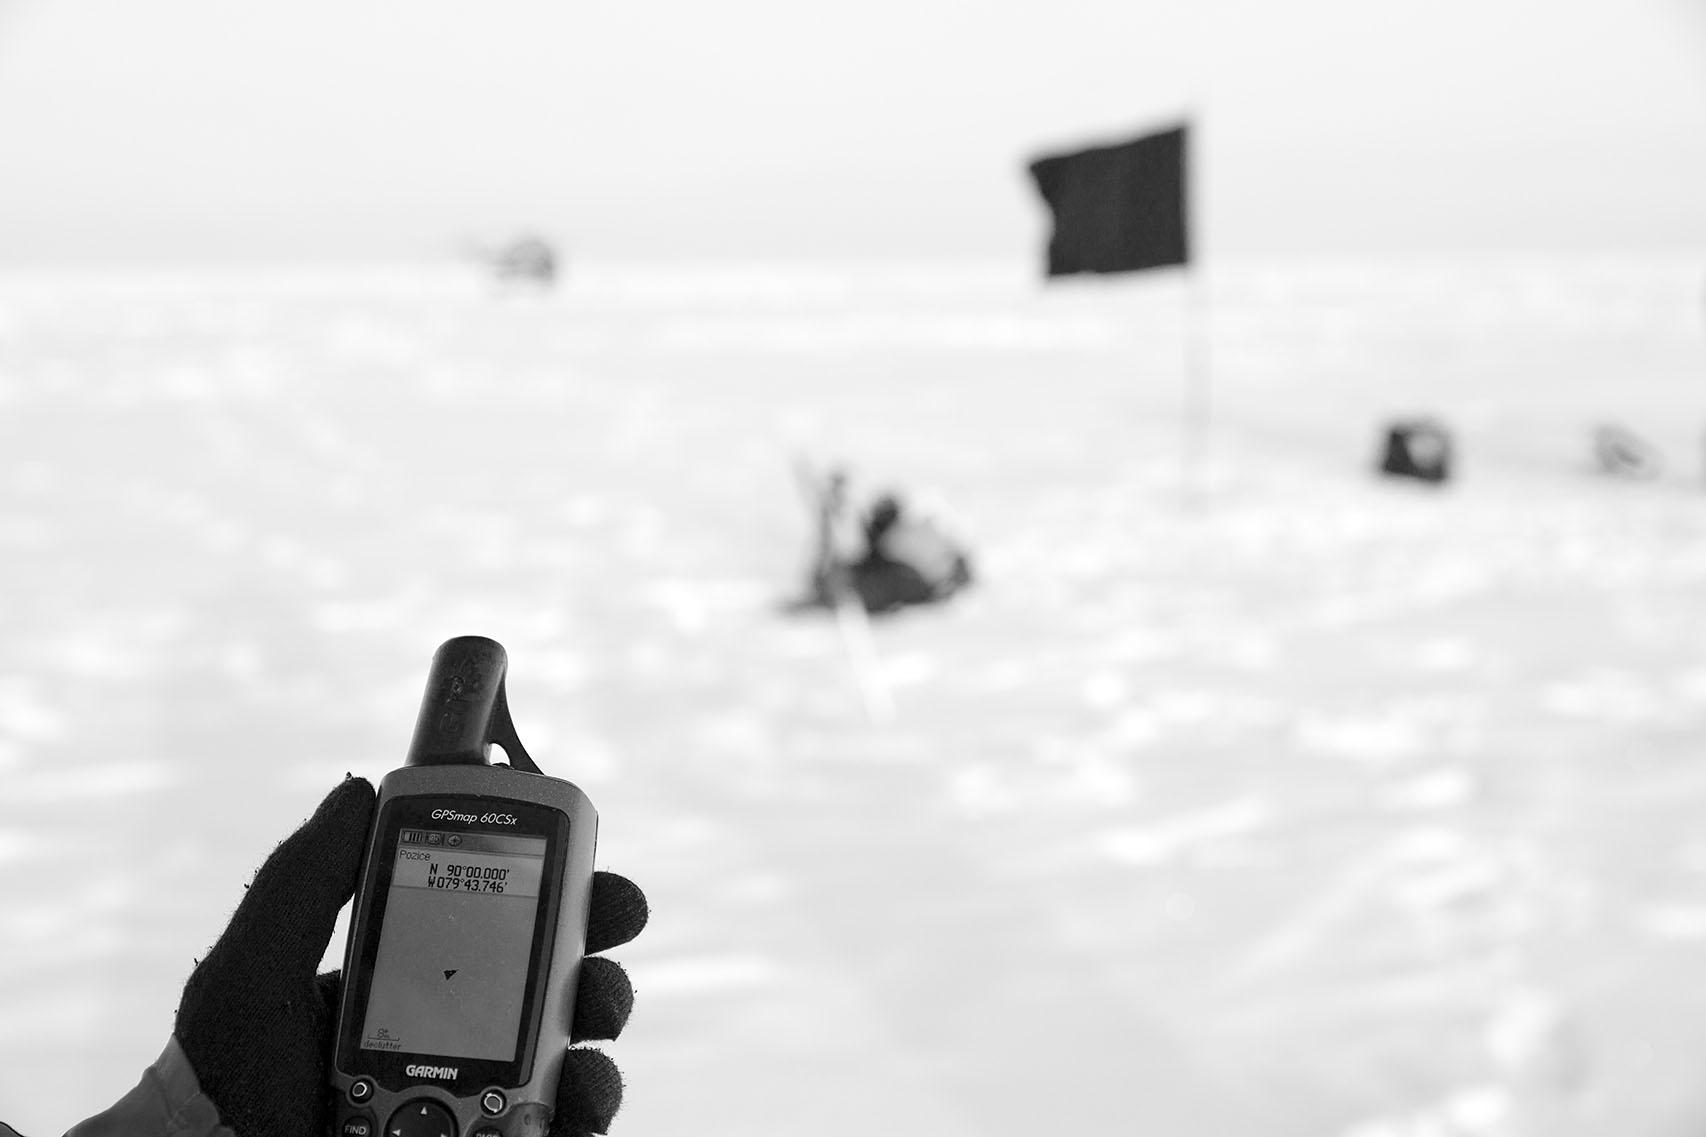 North Pole Documentation, 2015